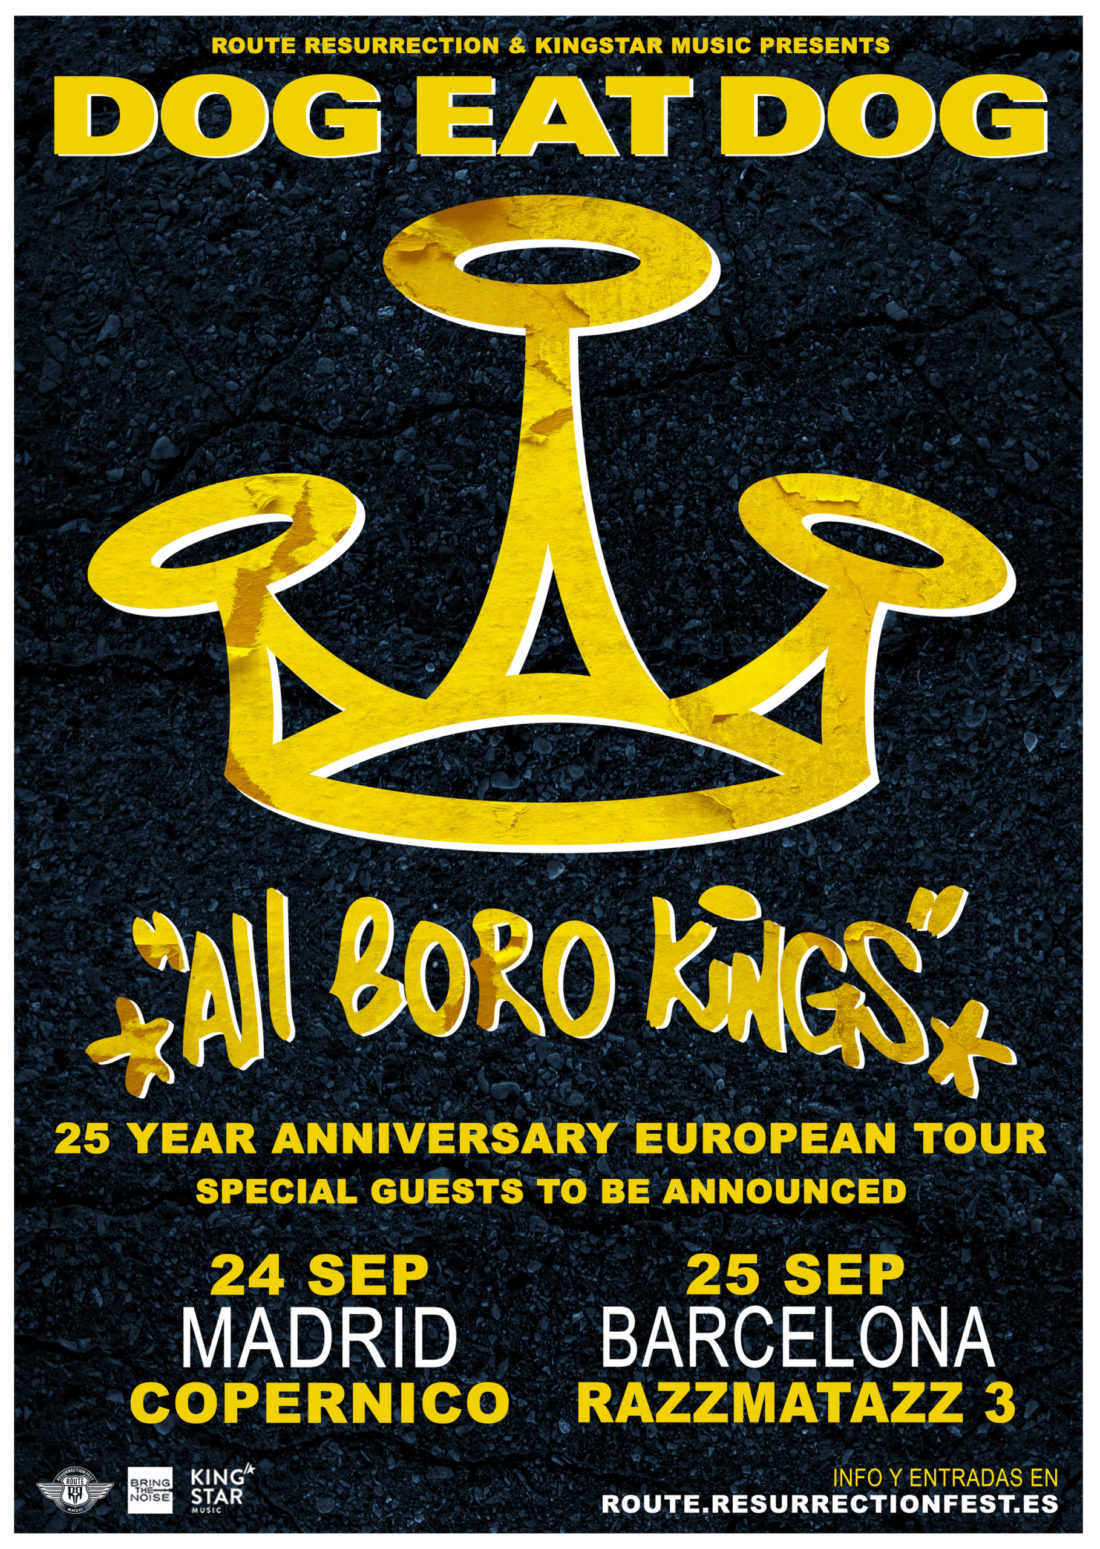 Nueva gira Route Resurrection: Dog Eat Dog – 25th Anniversary «All Boro Kings»